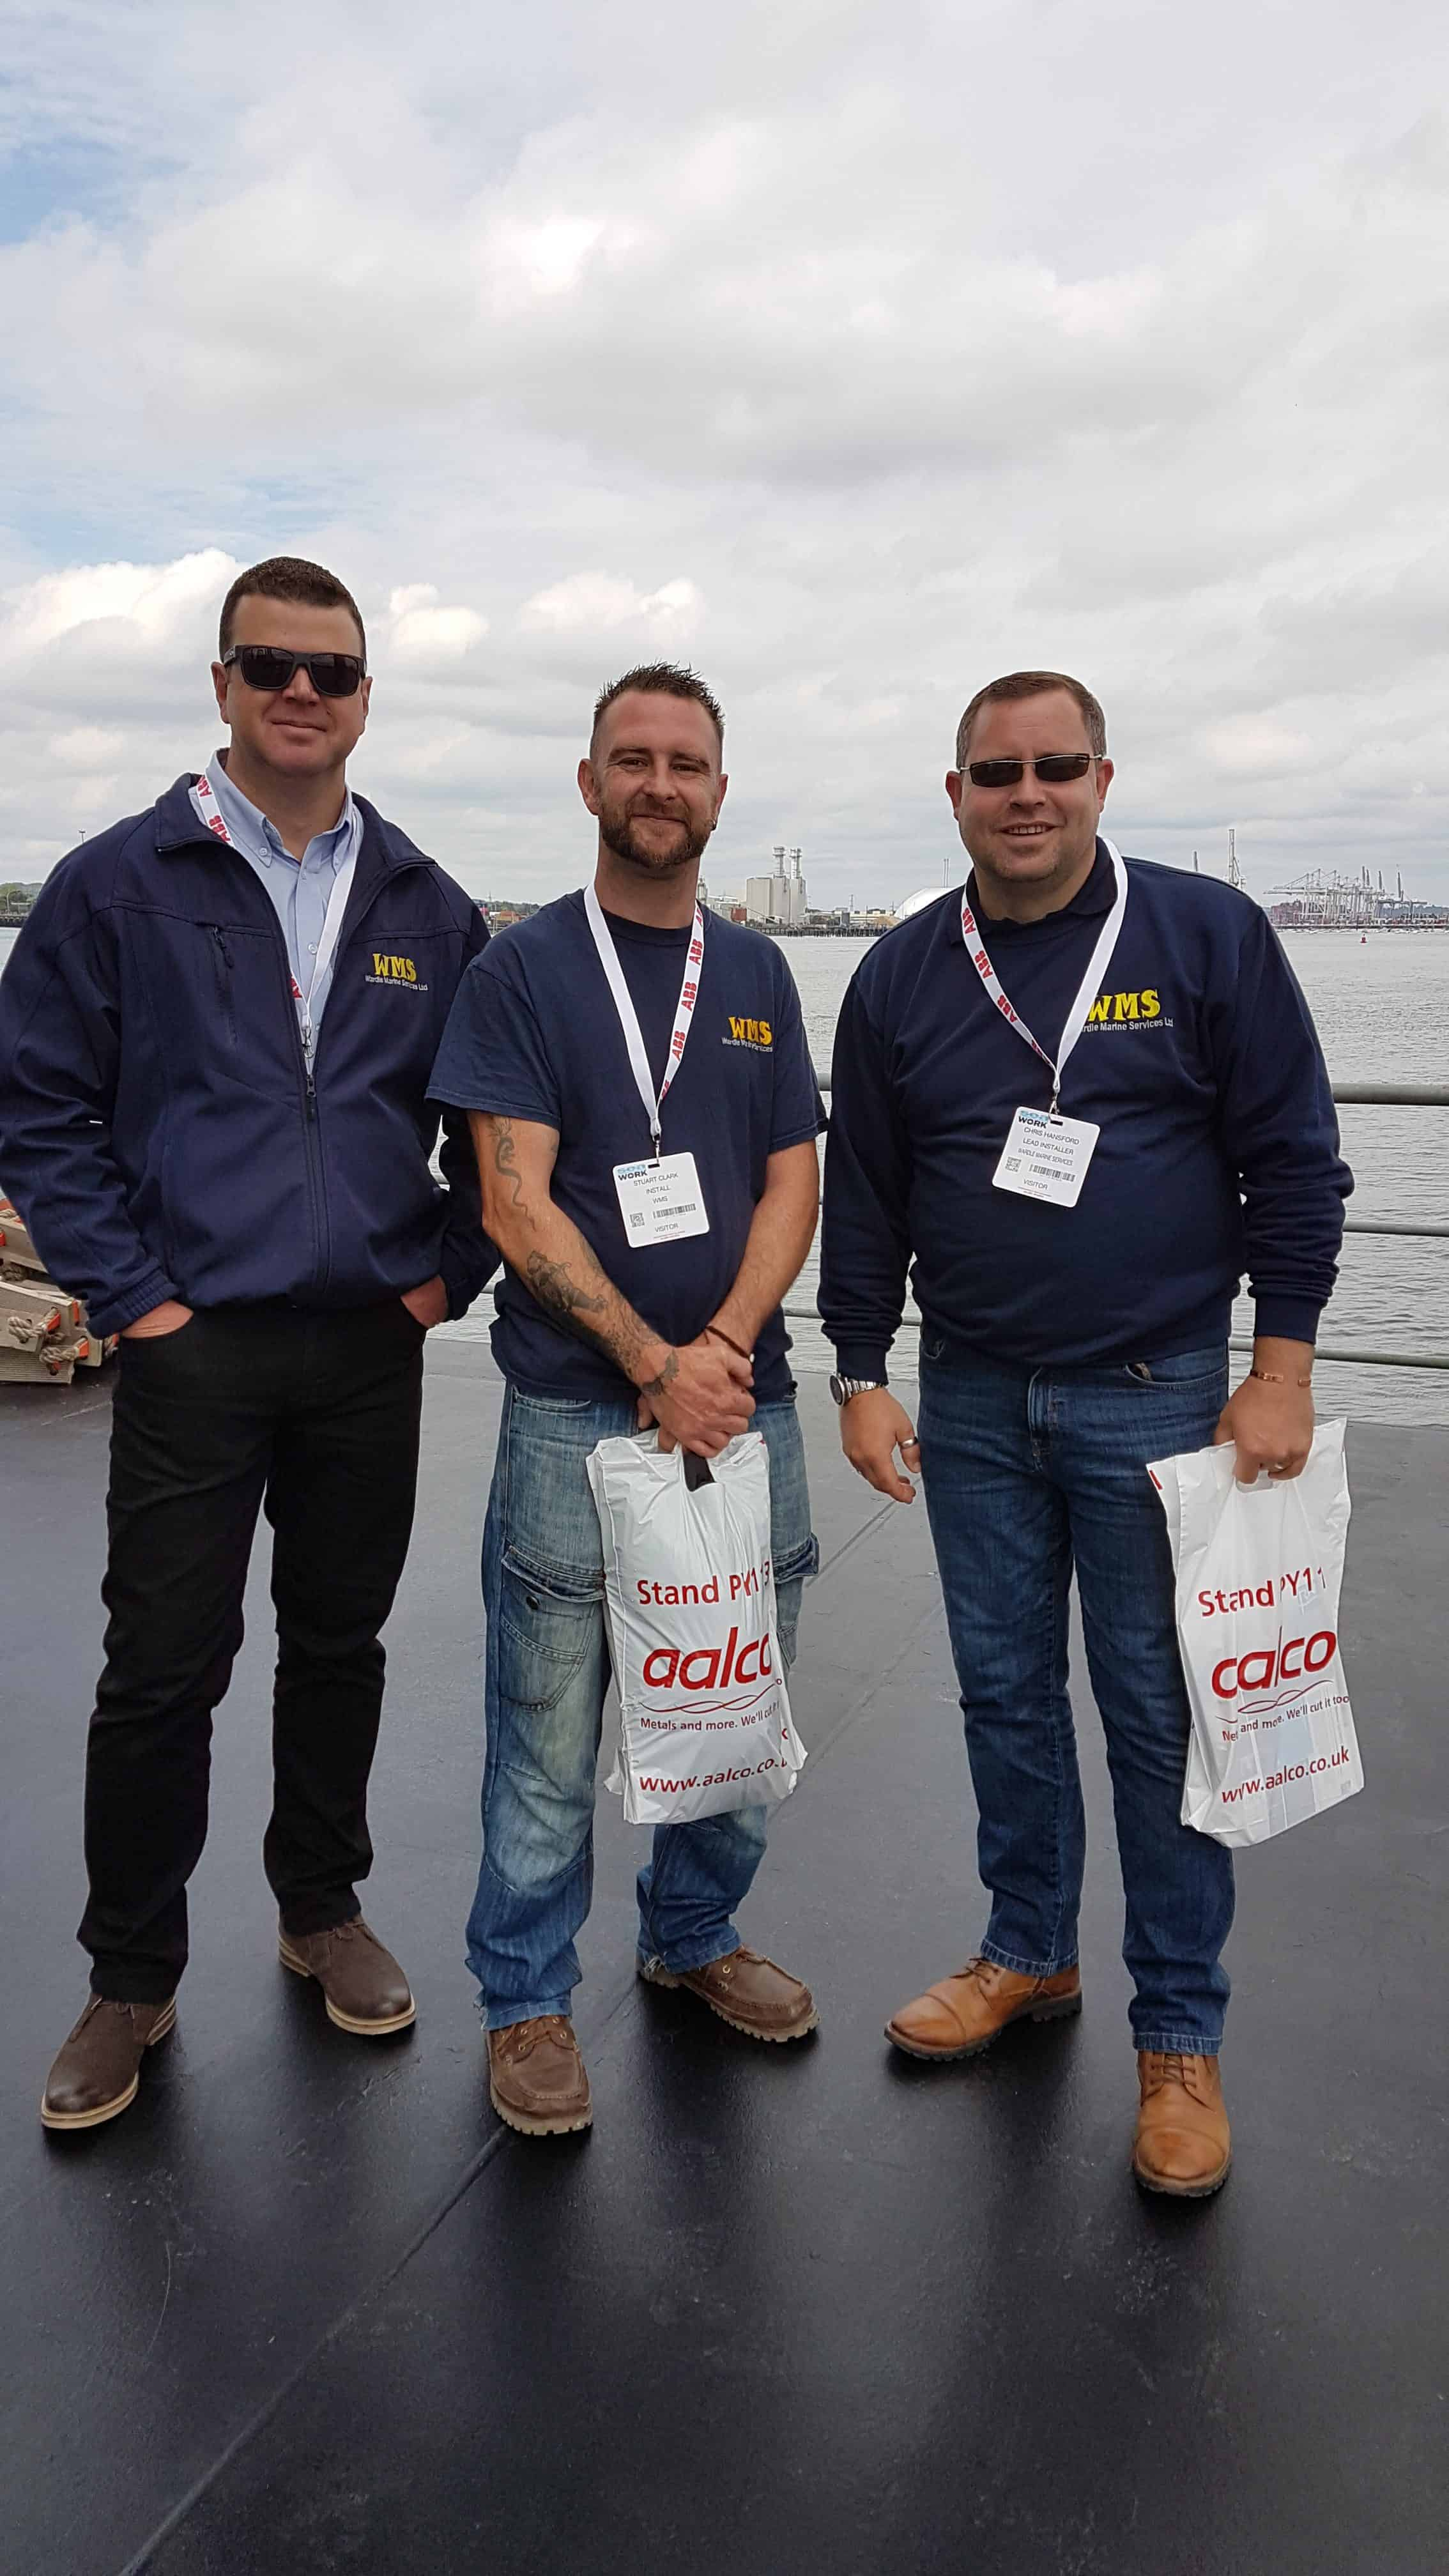 Team at Seaworks